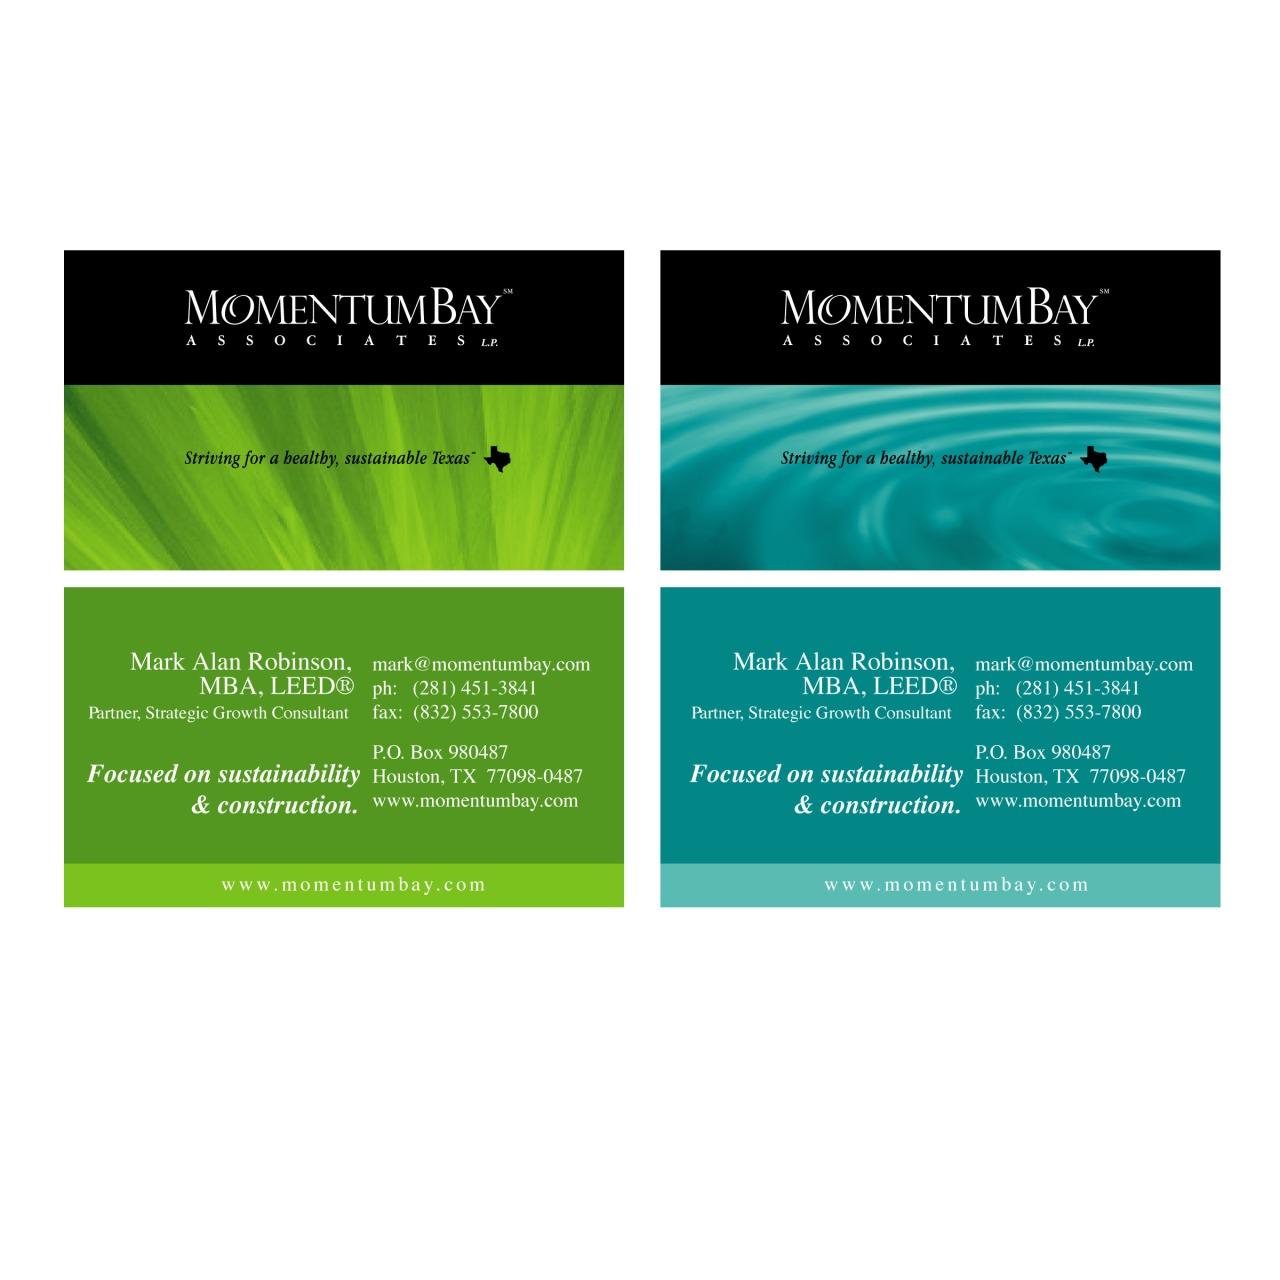 Momentum Bay Associates